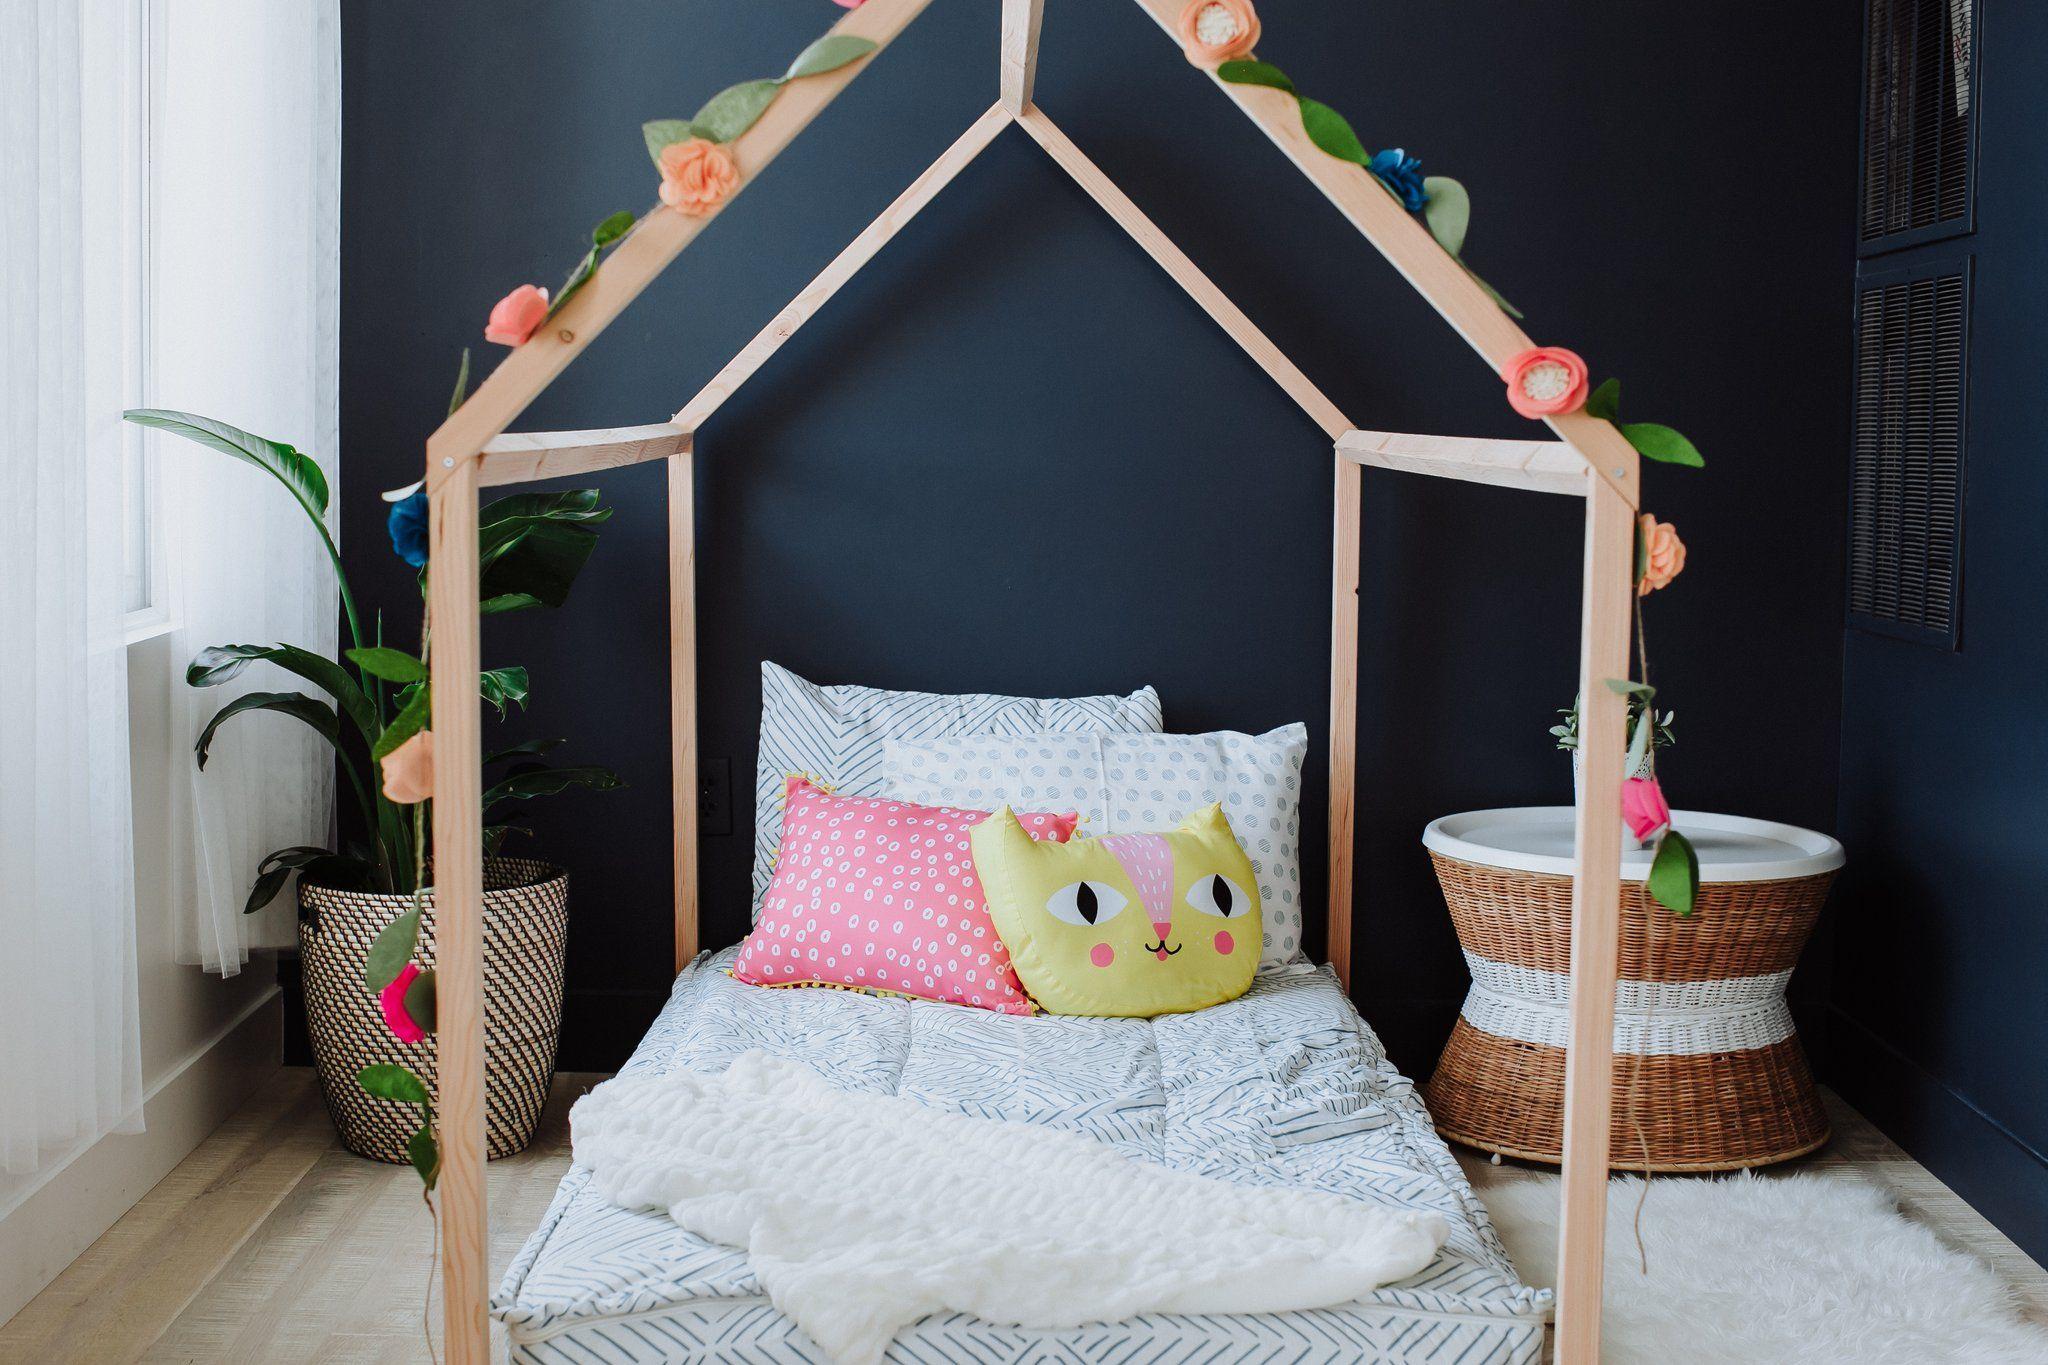 Top Selling House Bed For Kids Kids Room Ideas Kids Room Design